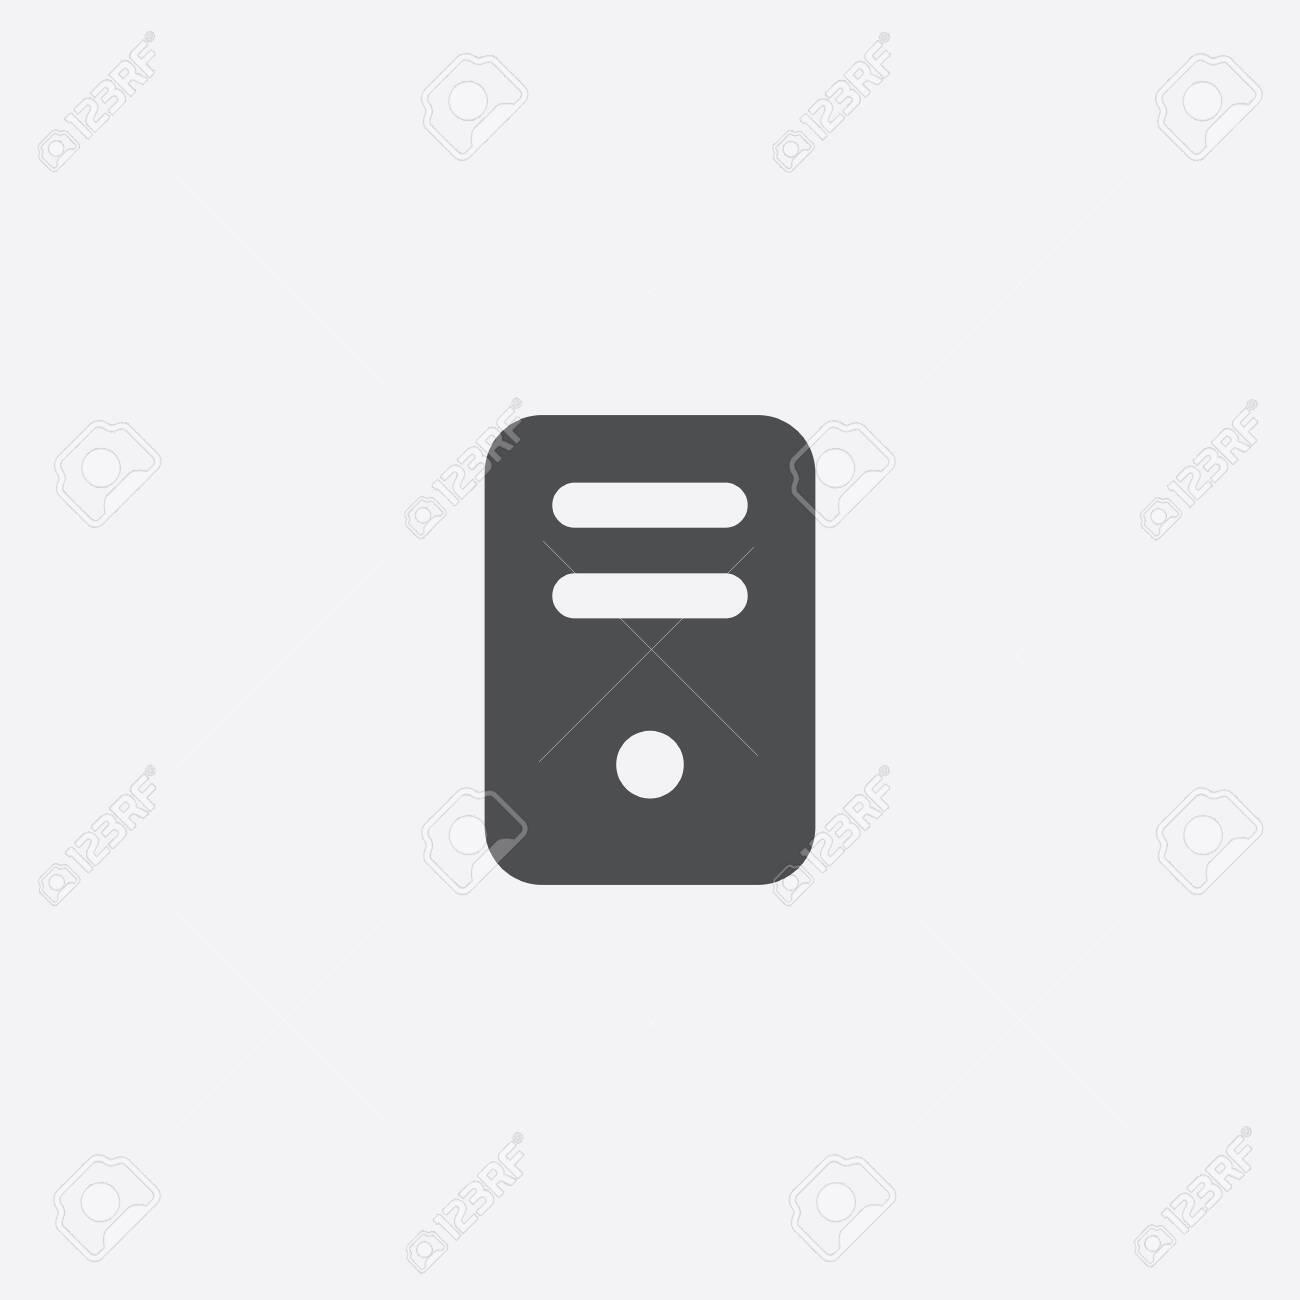 computer icon - 143059867